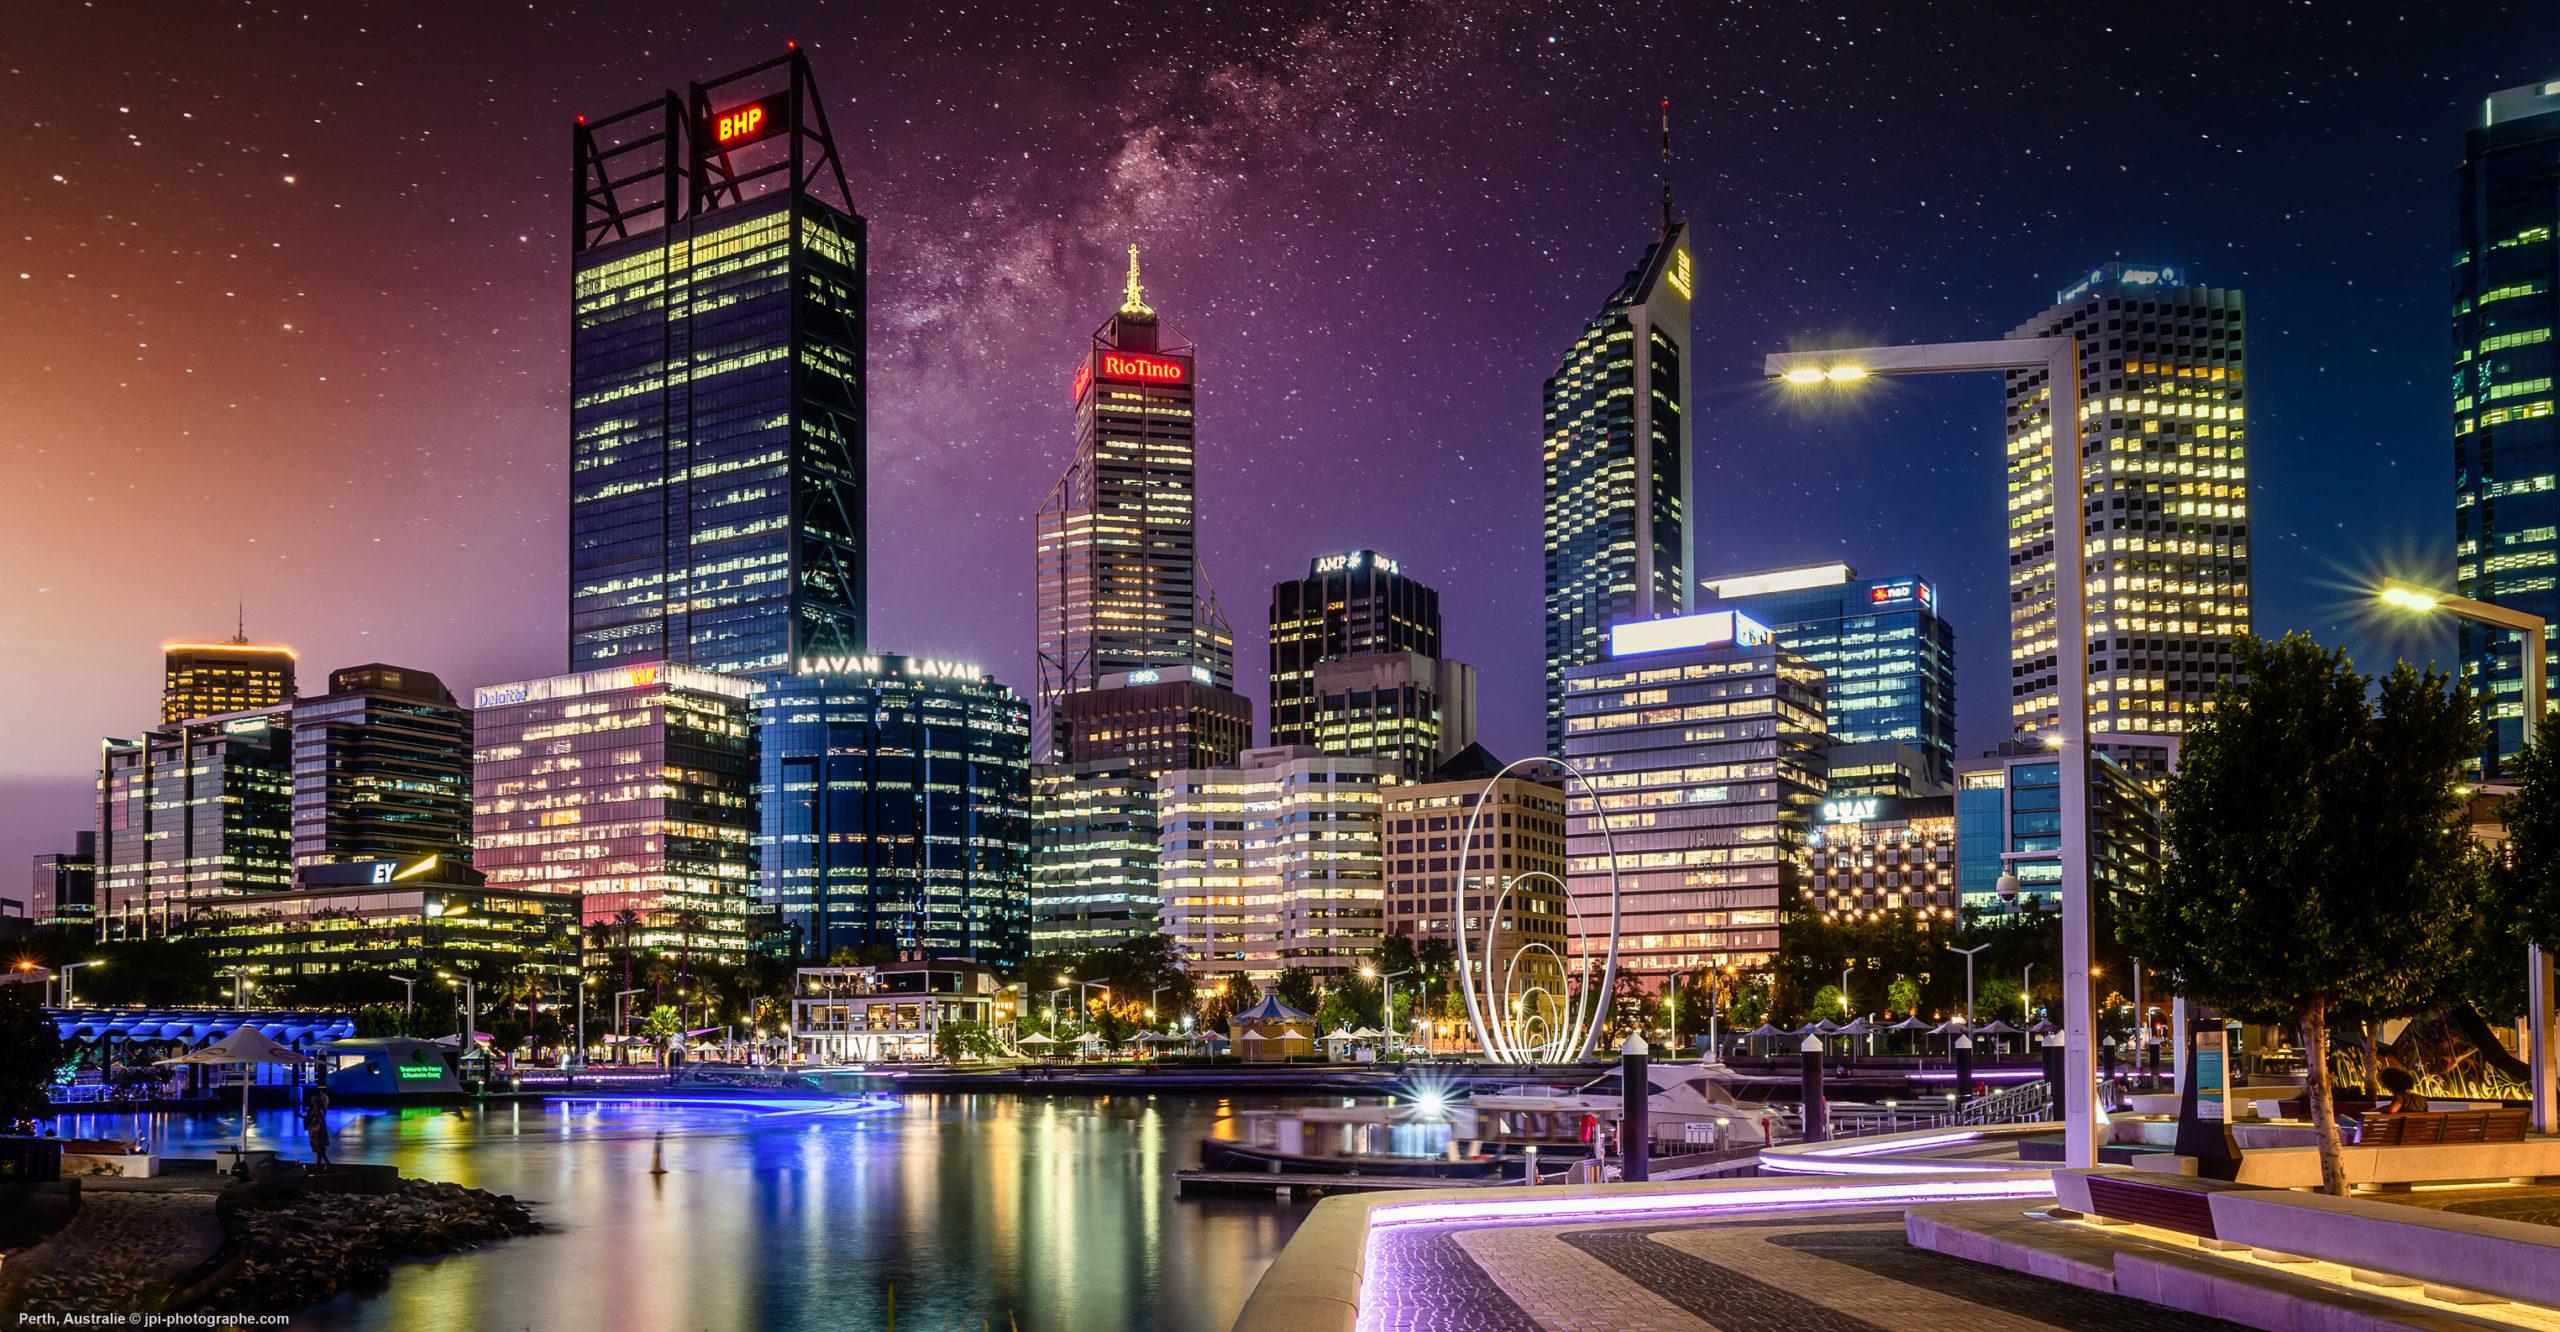 photographie JPI Mulhouse Australie Perth by night